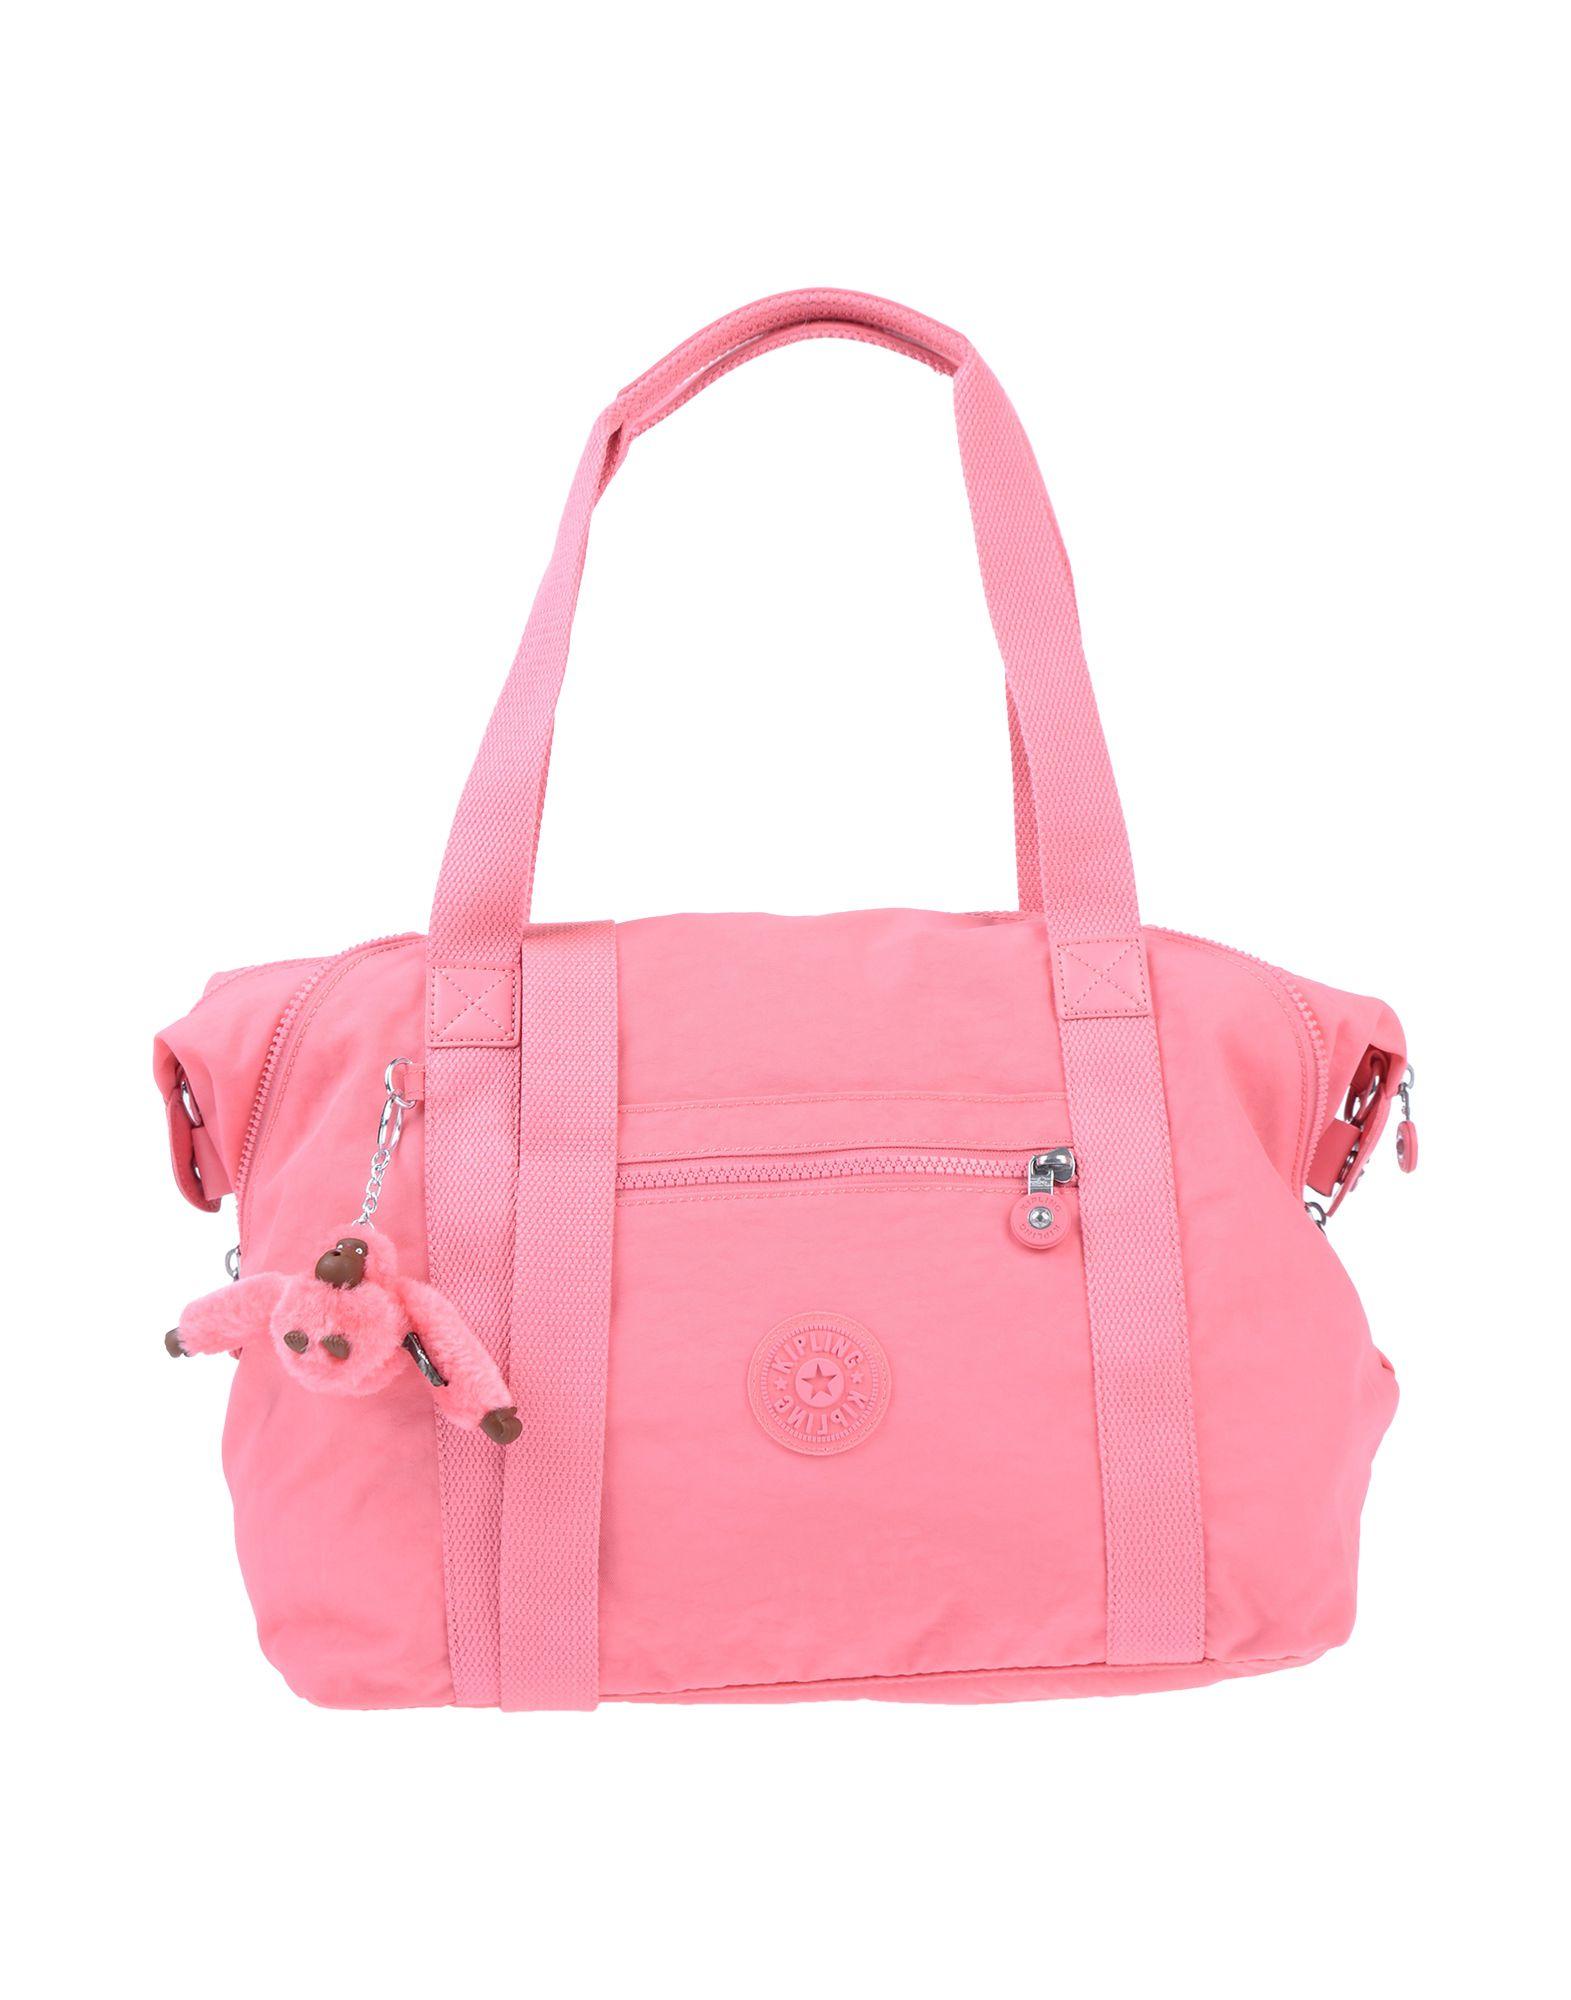 8009be350 Kipling Handbag - Women Kipling Handbags online on YOOX United ...